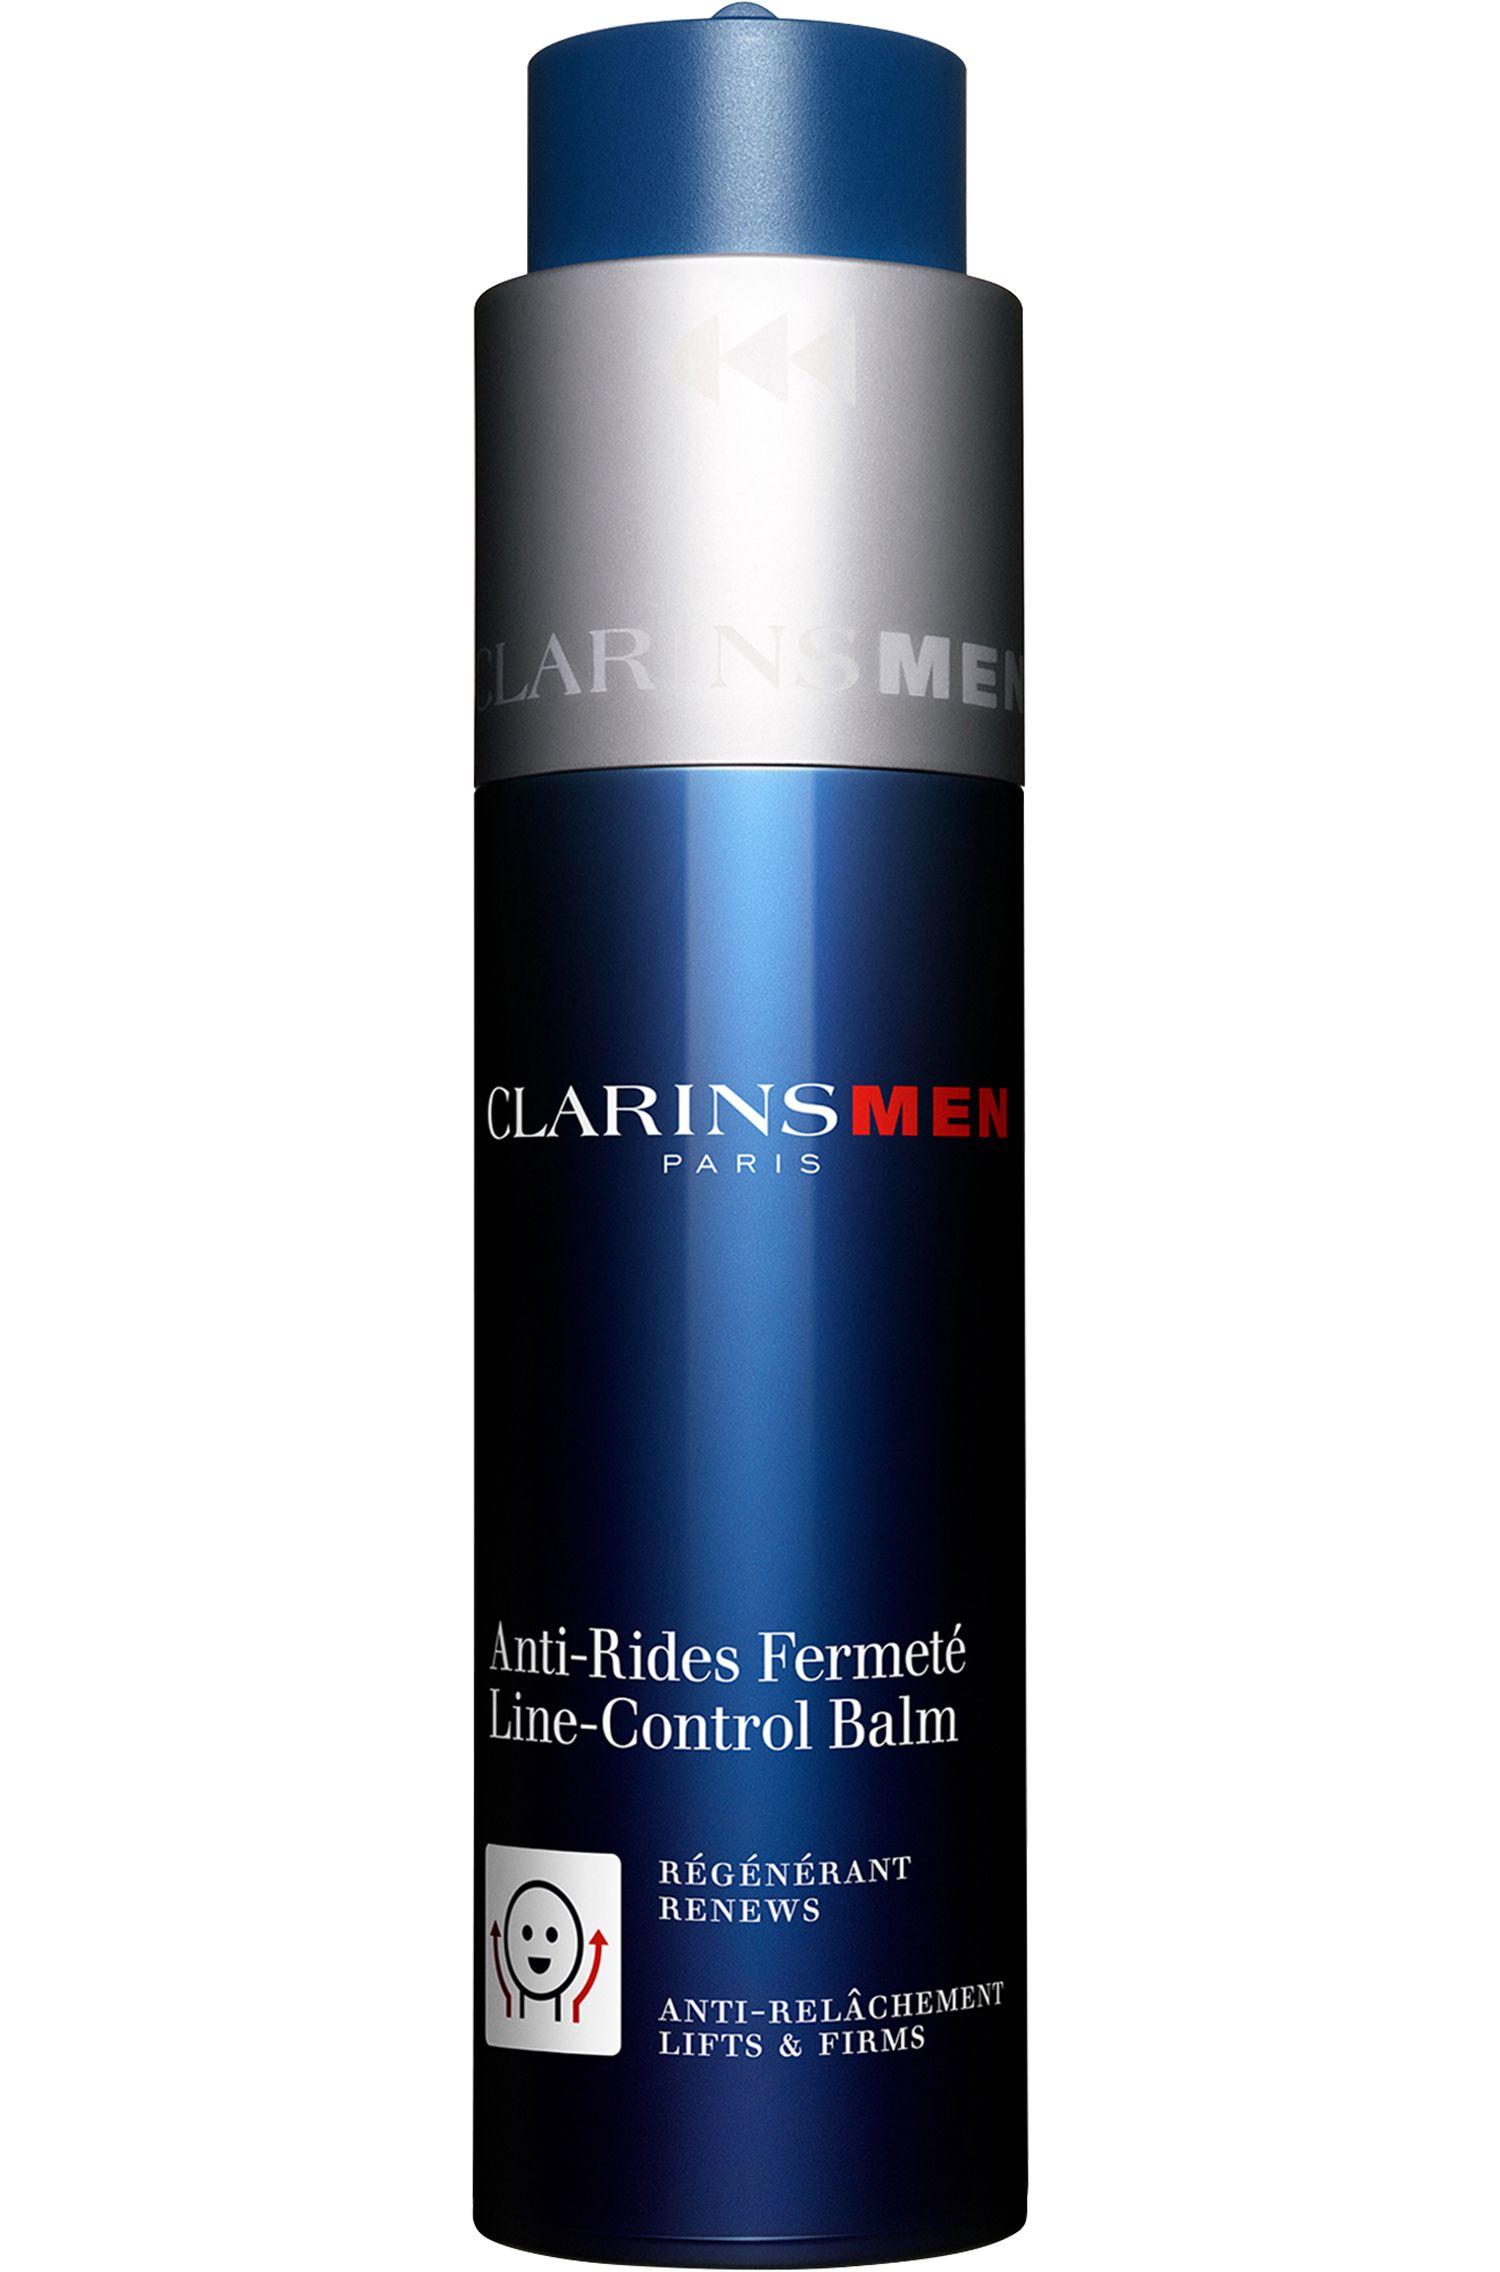 Blissim : Clarins - Baume anti-rides fermeté - Baume anti-rides fermeté